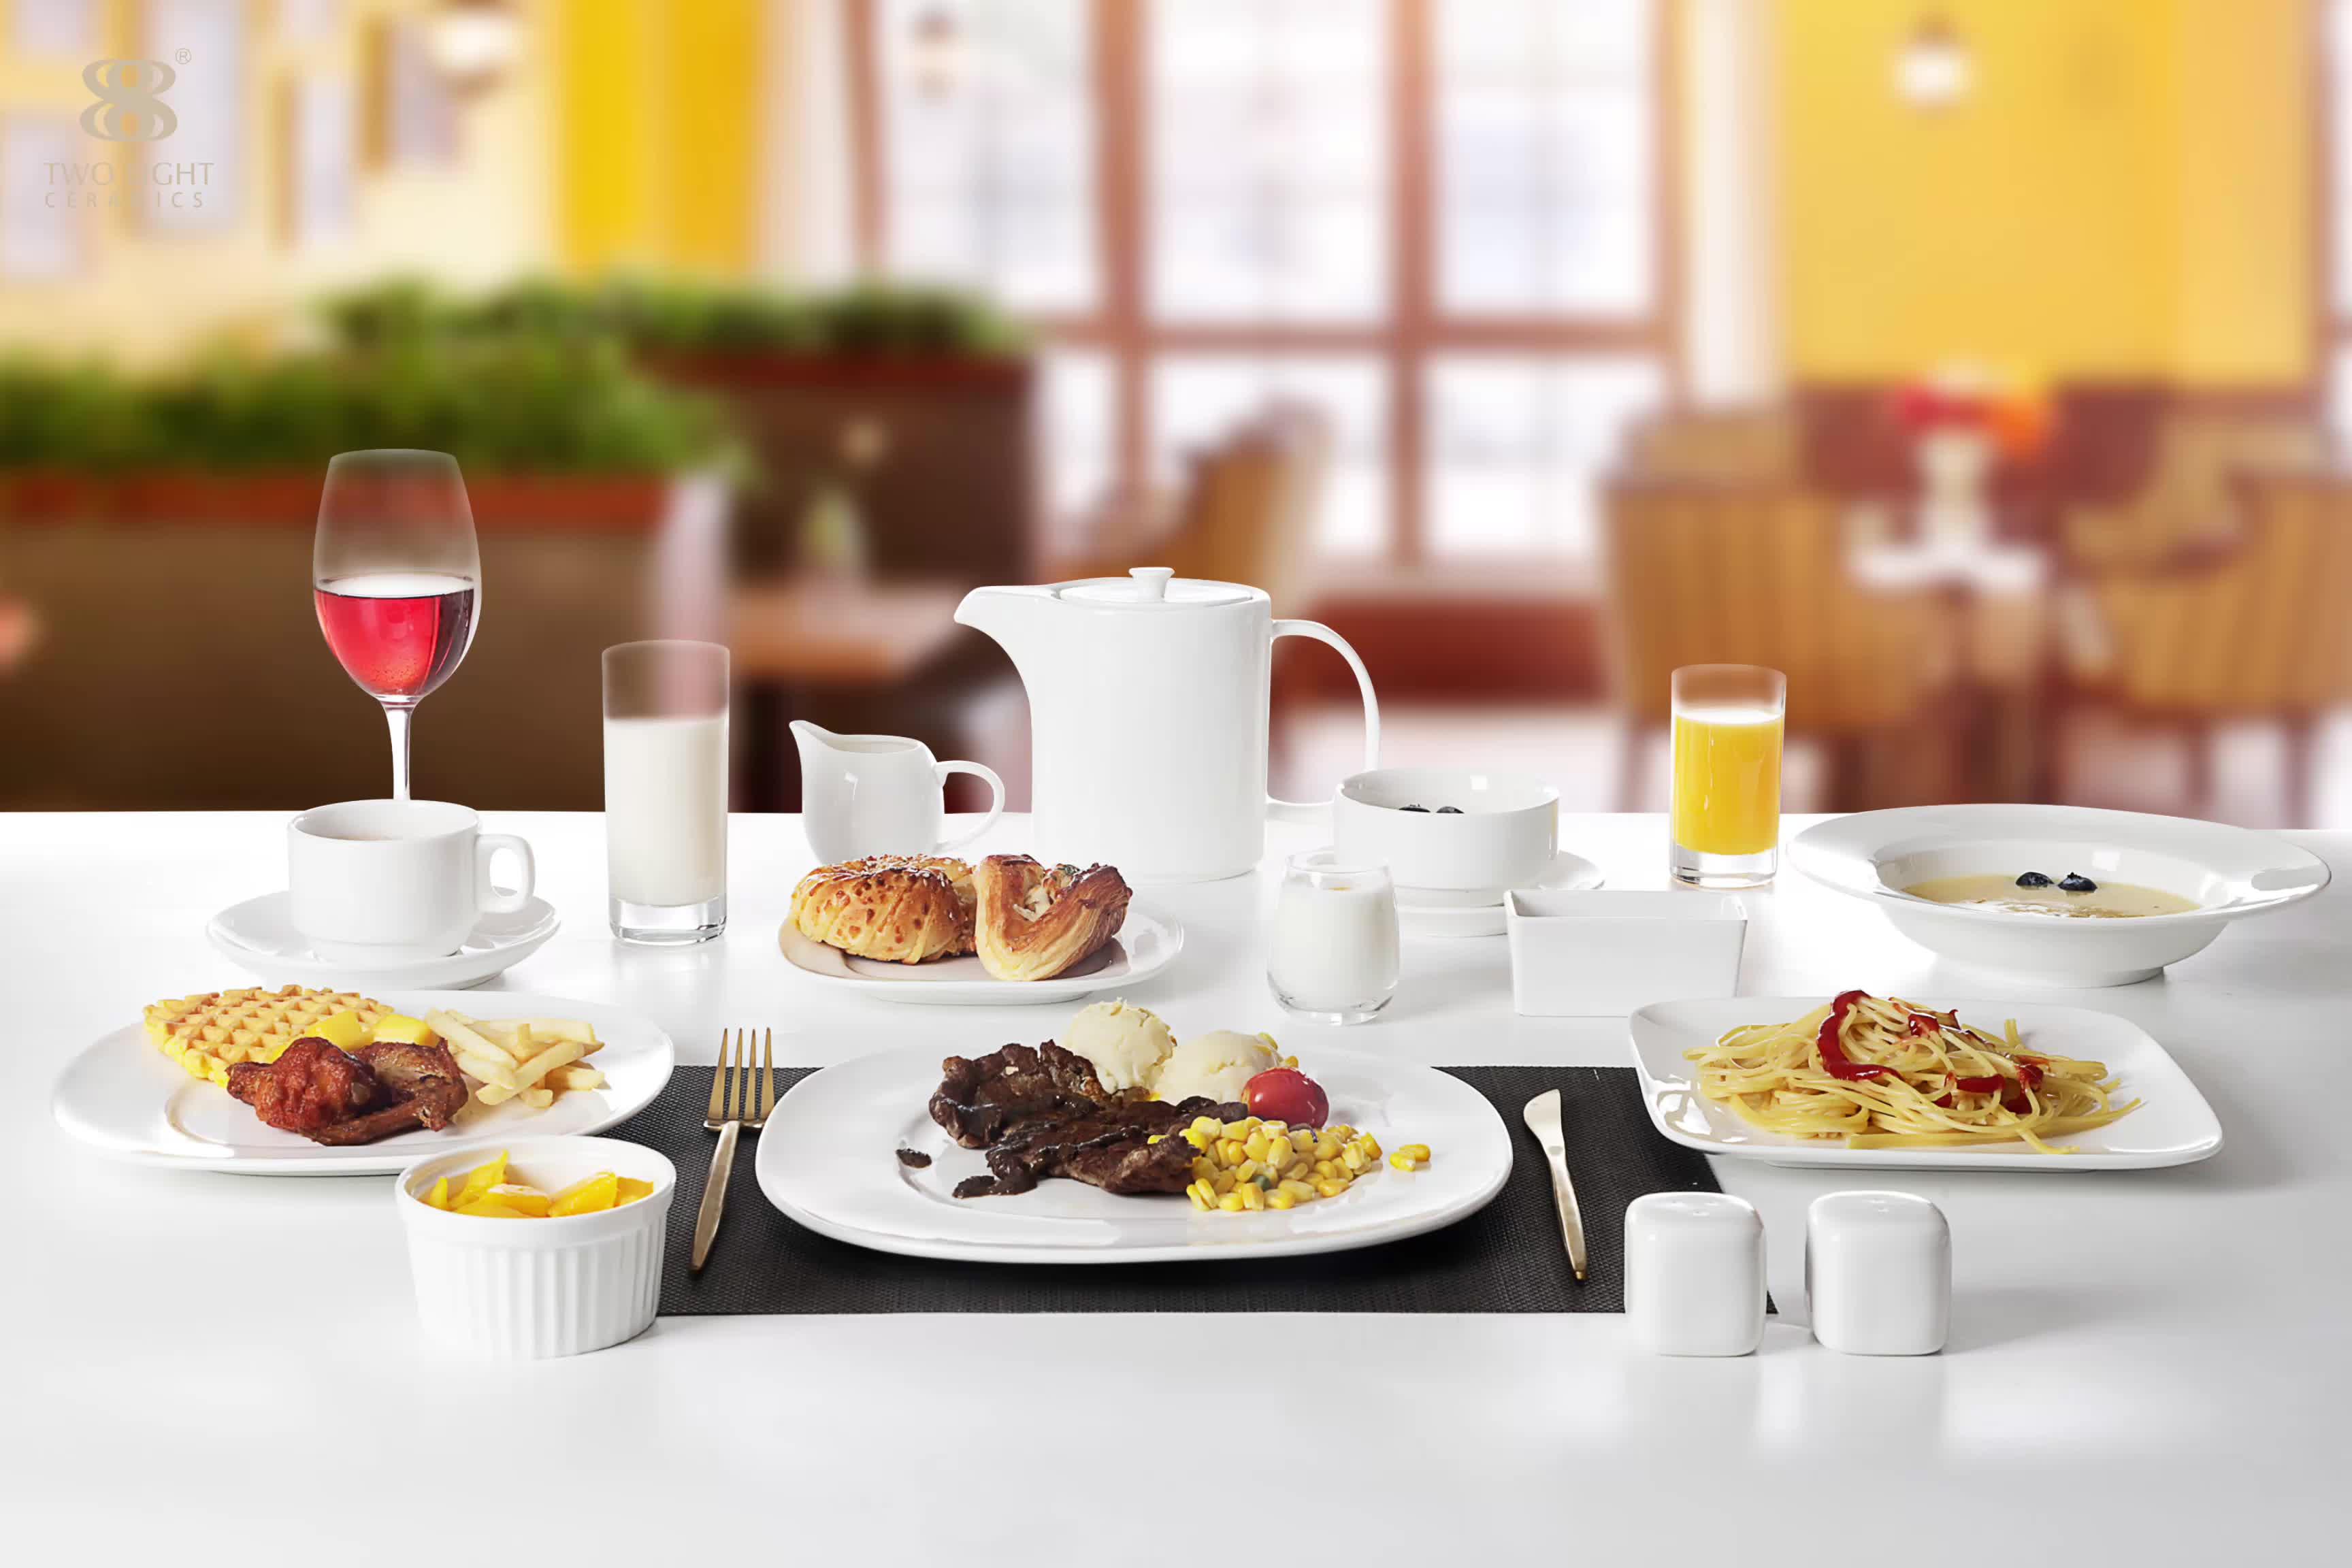 Hot Sale Scratch proof Restaurant Ceramics Dinner Set, Catering Porcelain Square Dinnerware Set, Hotel Plates Set Squares